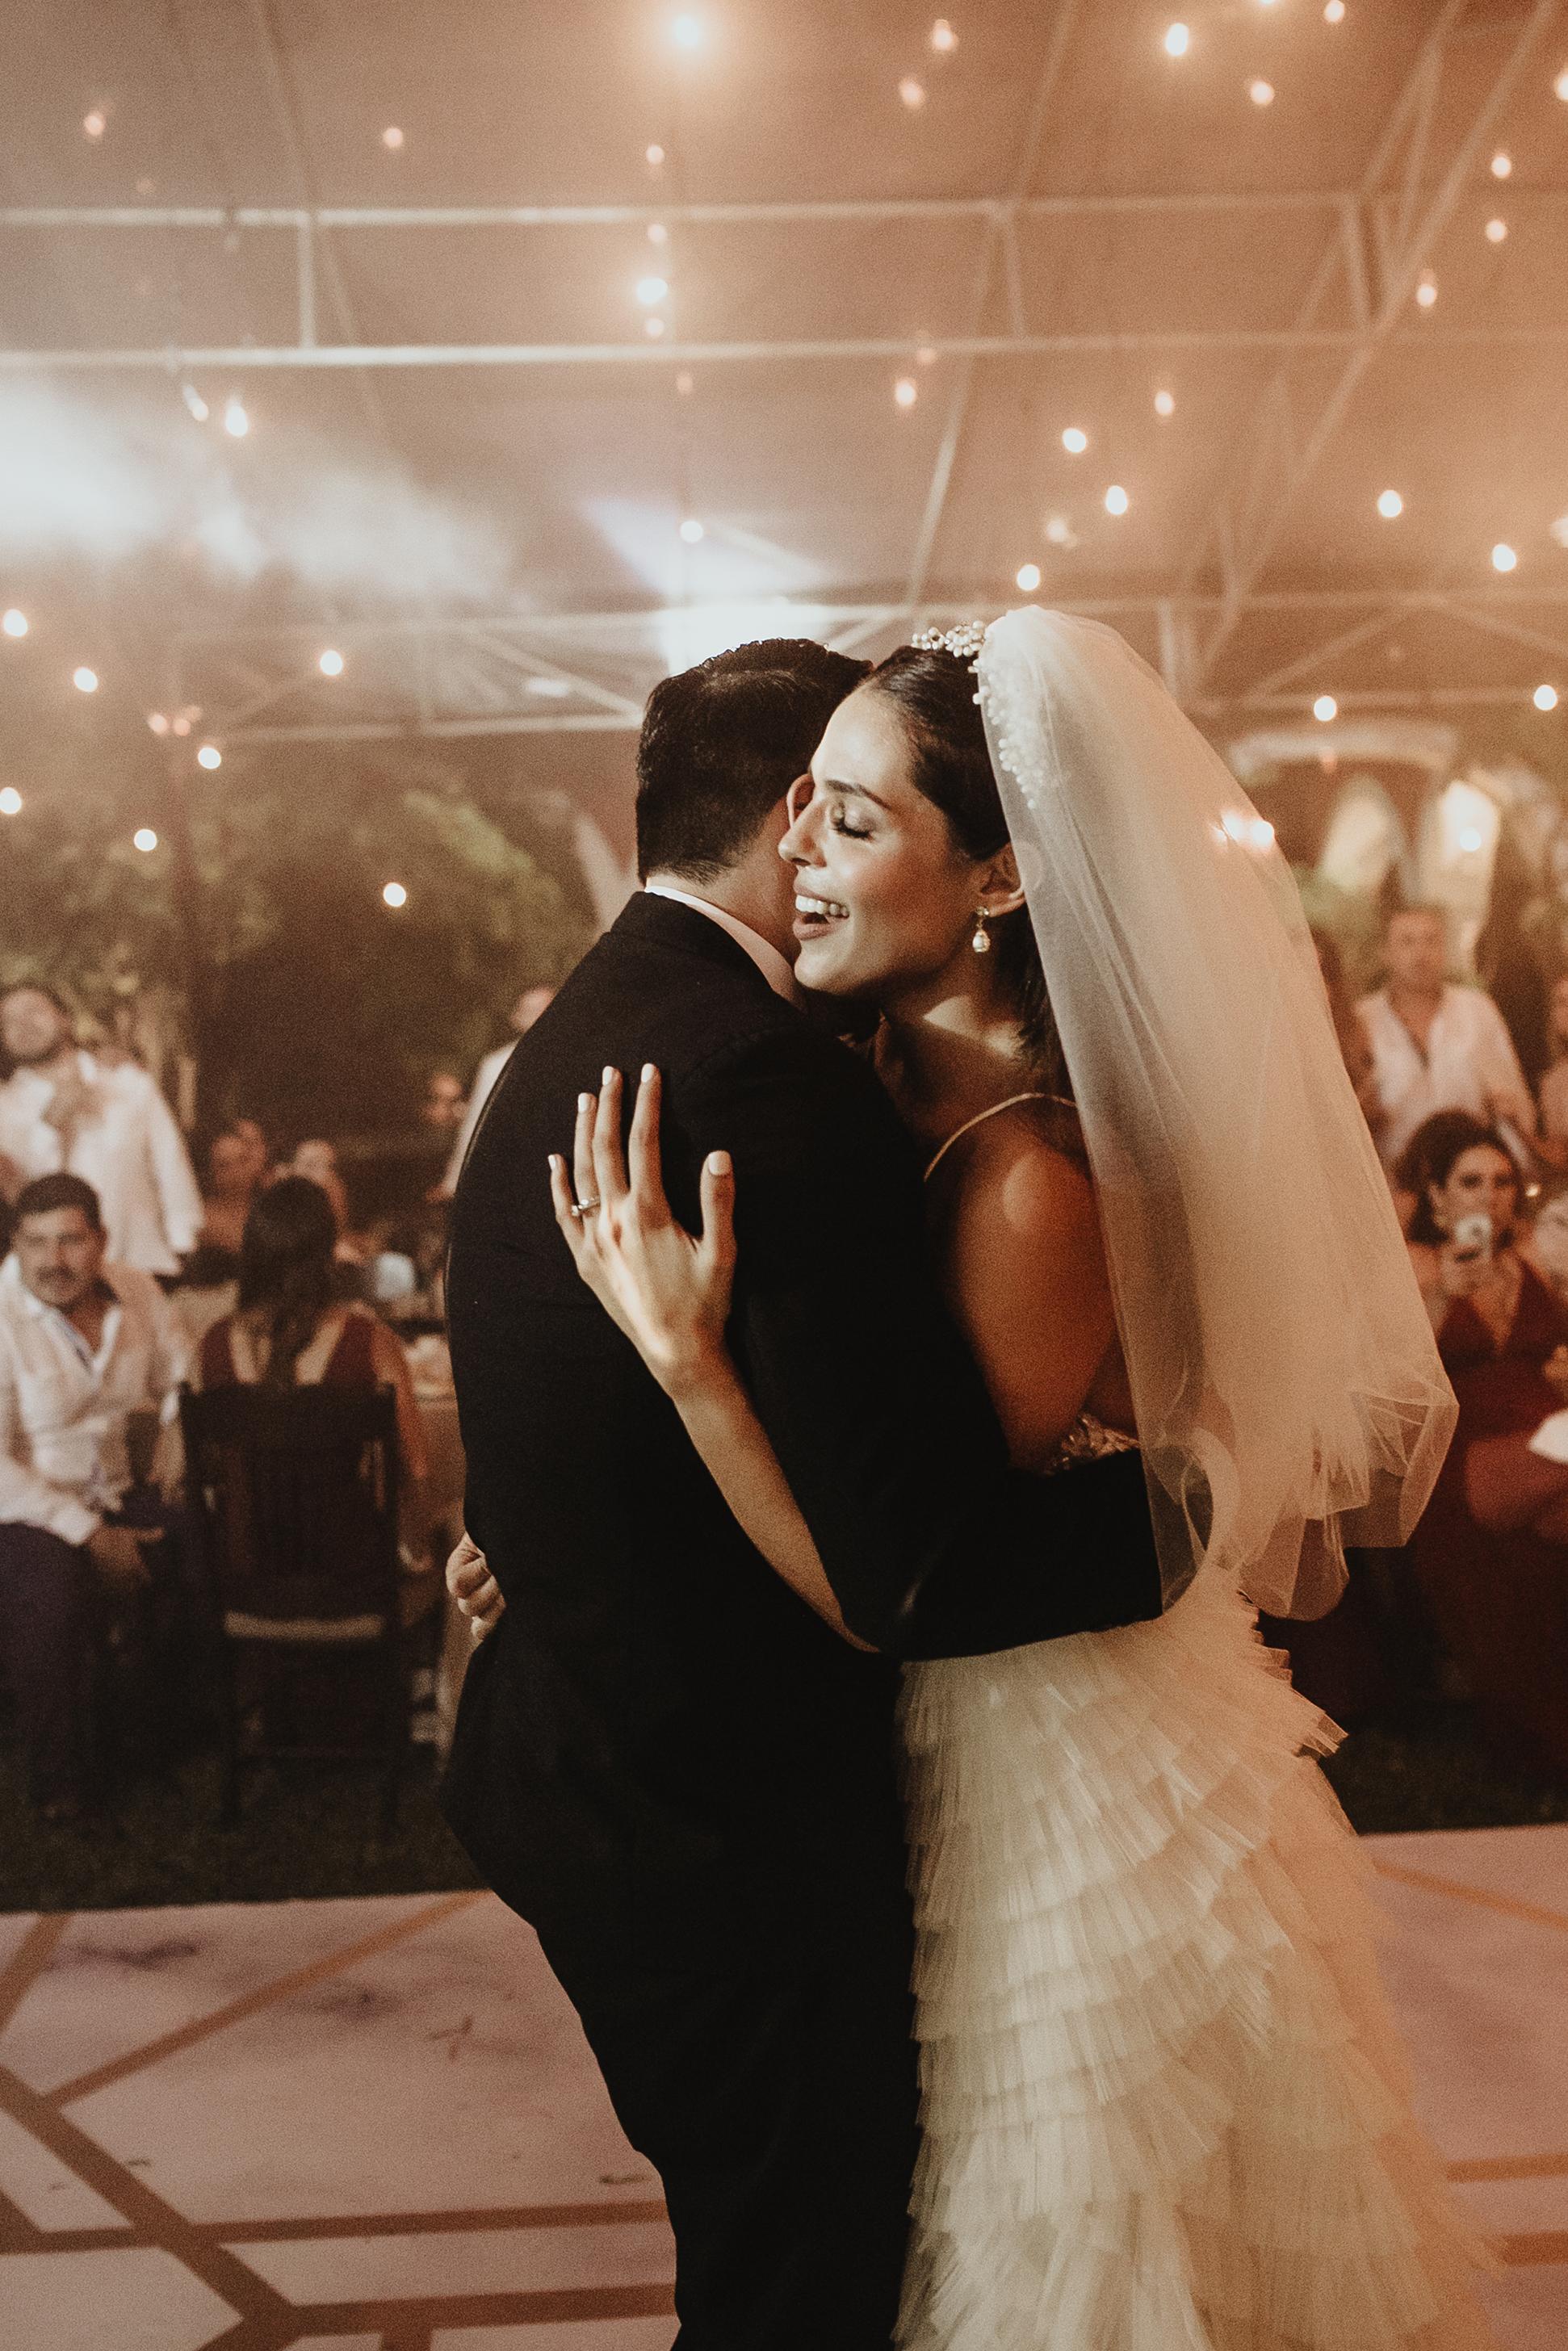 1124R&F__WeddingDestination_Weddingmerida_BodaMexico_FotografoDeBodas_FabrizioSimoneenFotografo.jpg